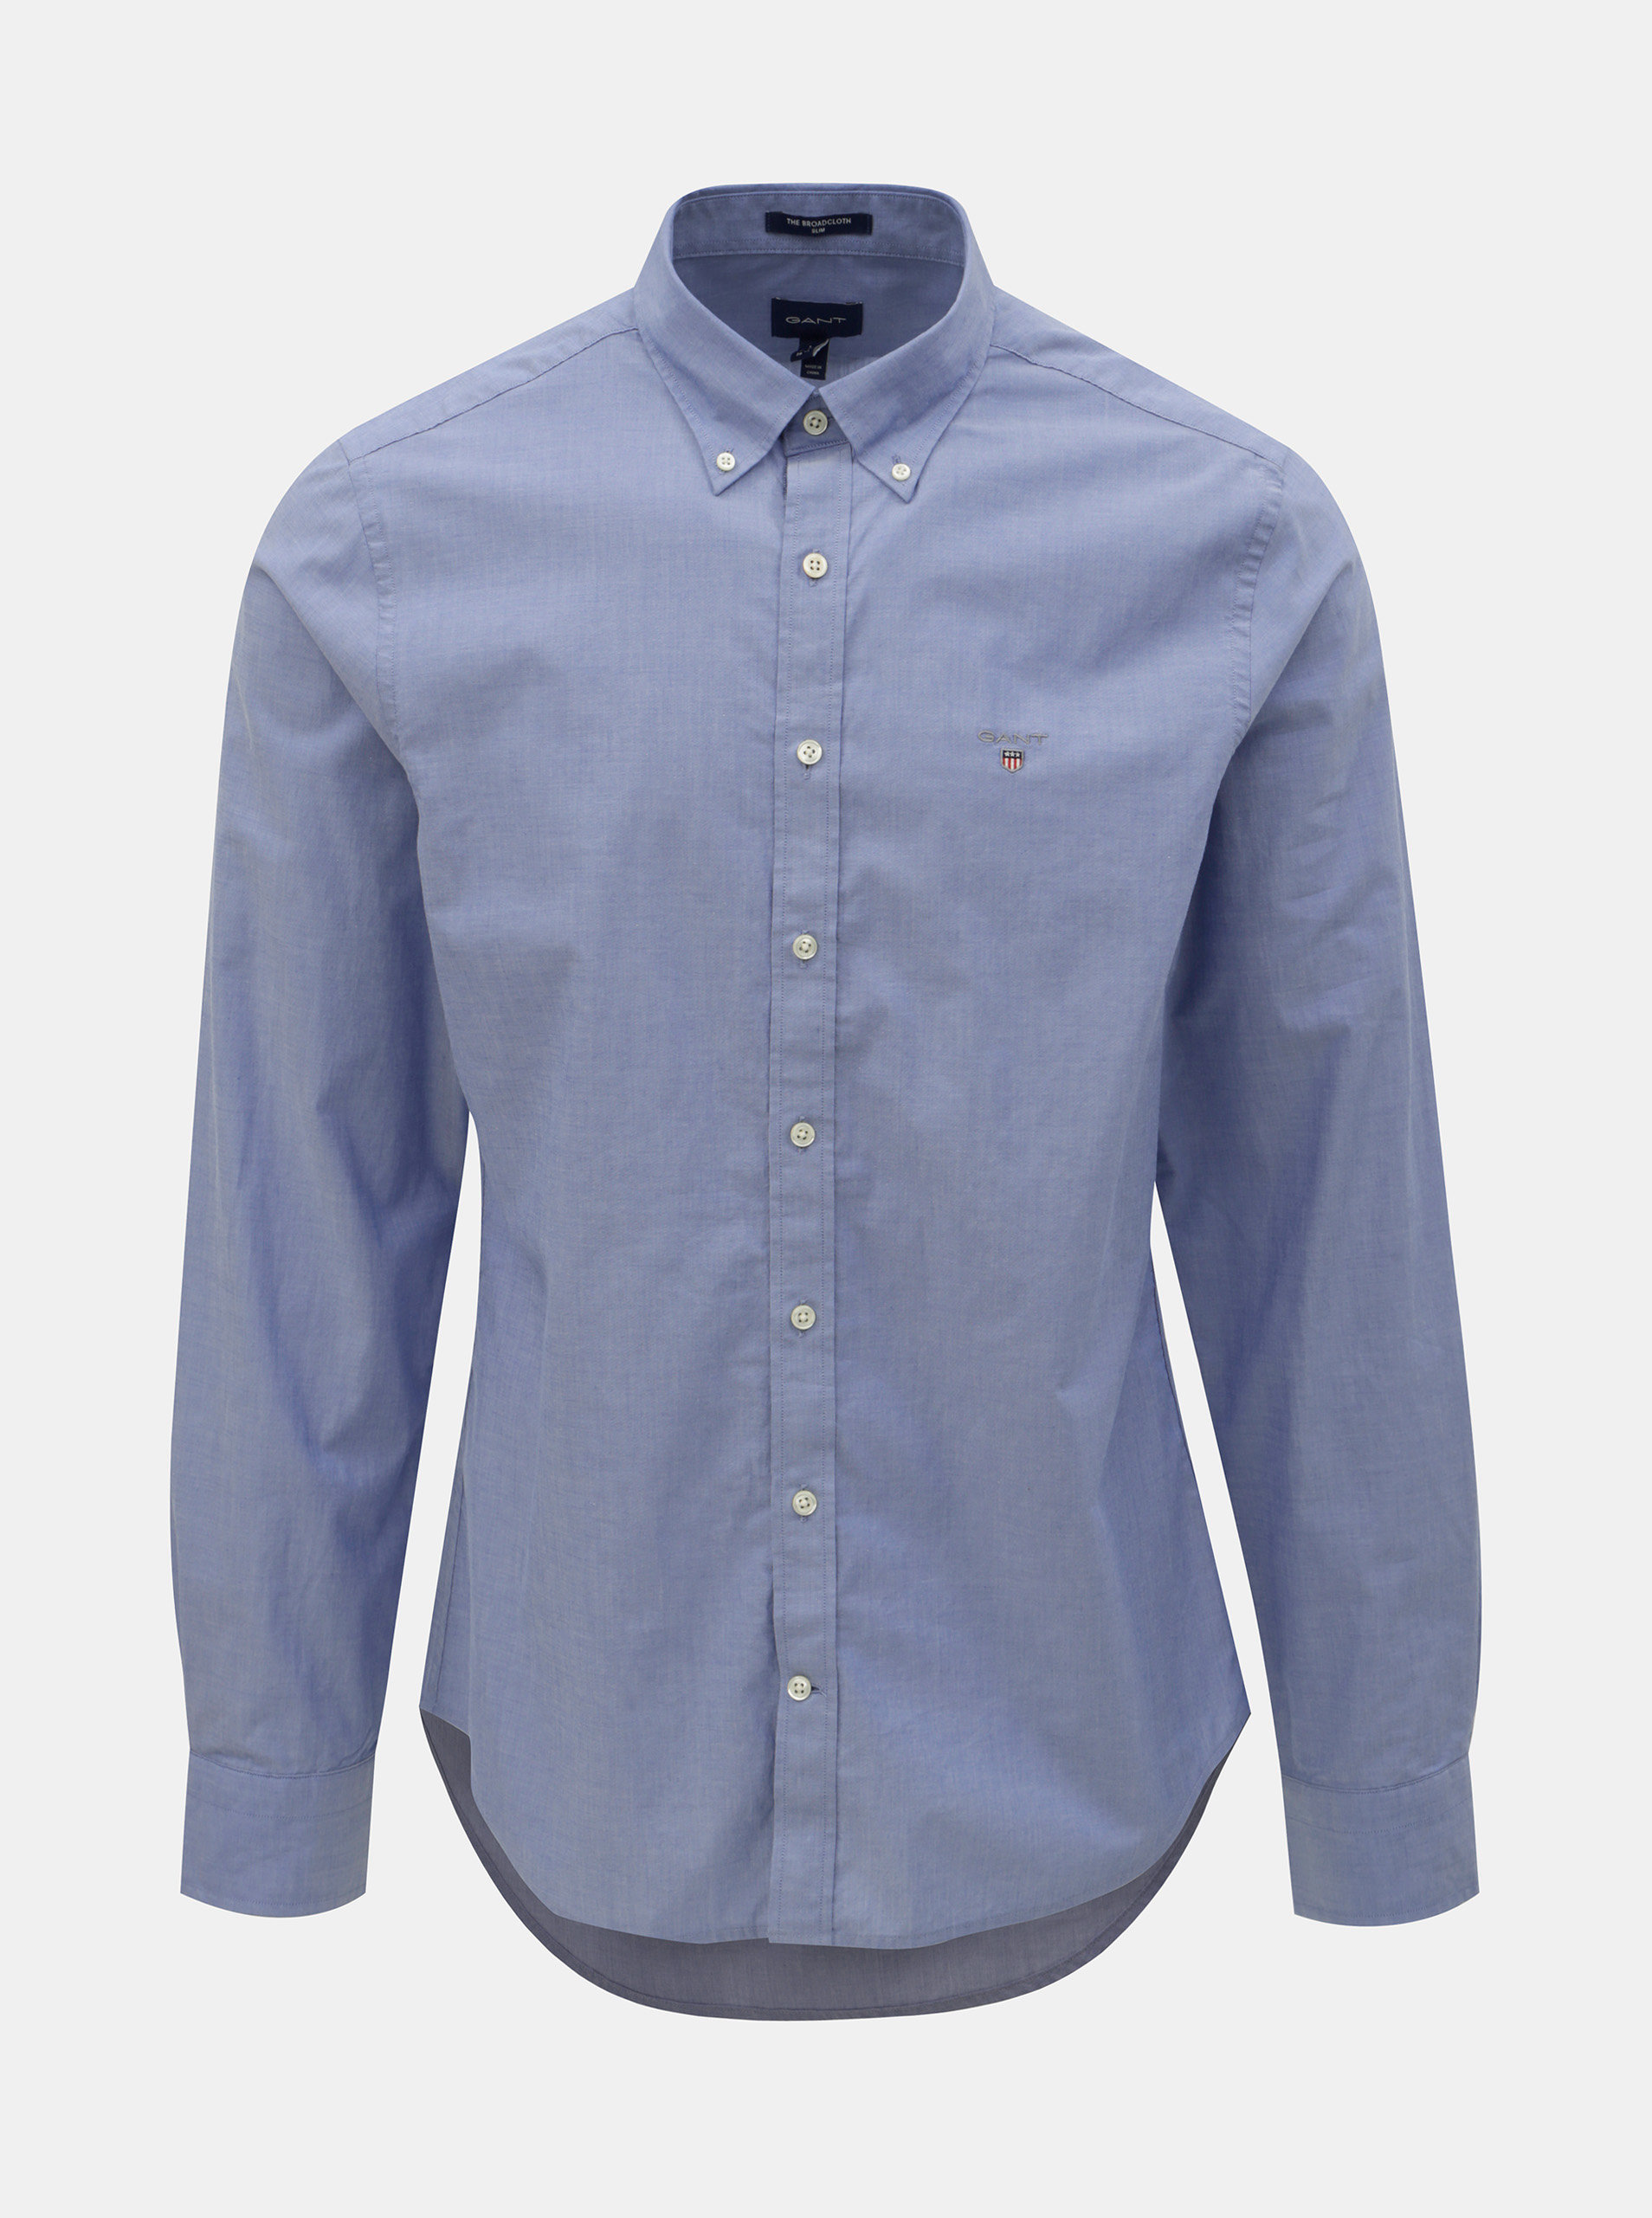 38417a6c0a4b Modrá pánska slim fit košeľa GANT ...